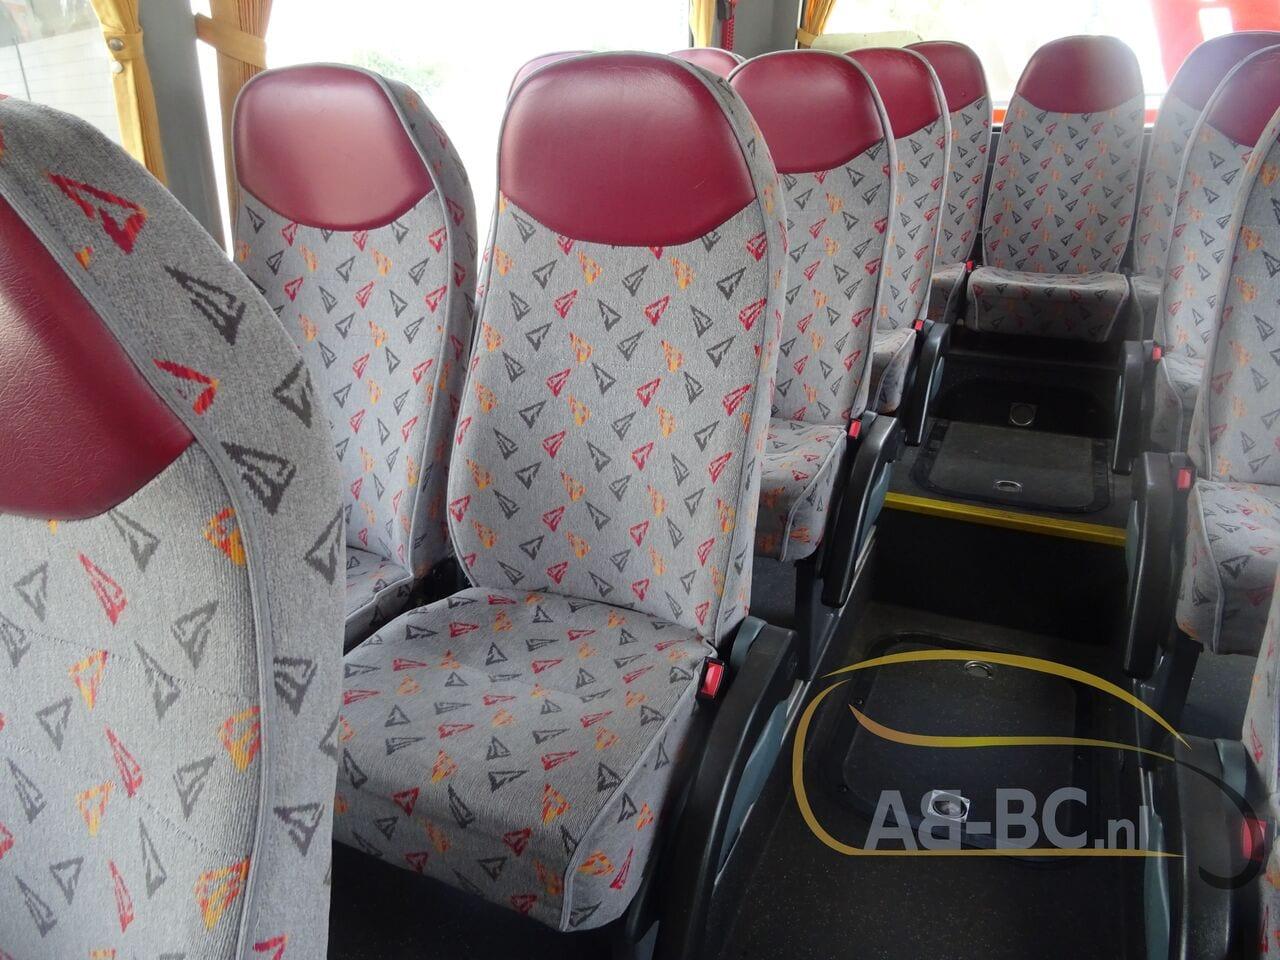 coach-busTEMSA-Safari-RD-DAF-Motor-53-Seats-Euro-5---1623932565161154363_big_783397da1e51a5aecb2bd4ef521ca226--21061715155620919600